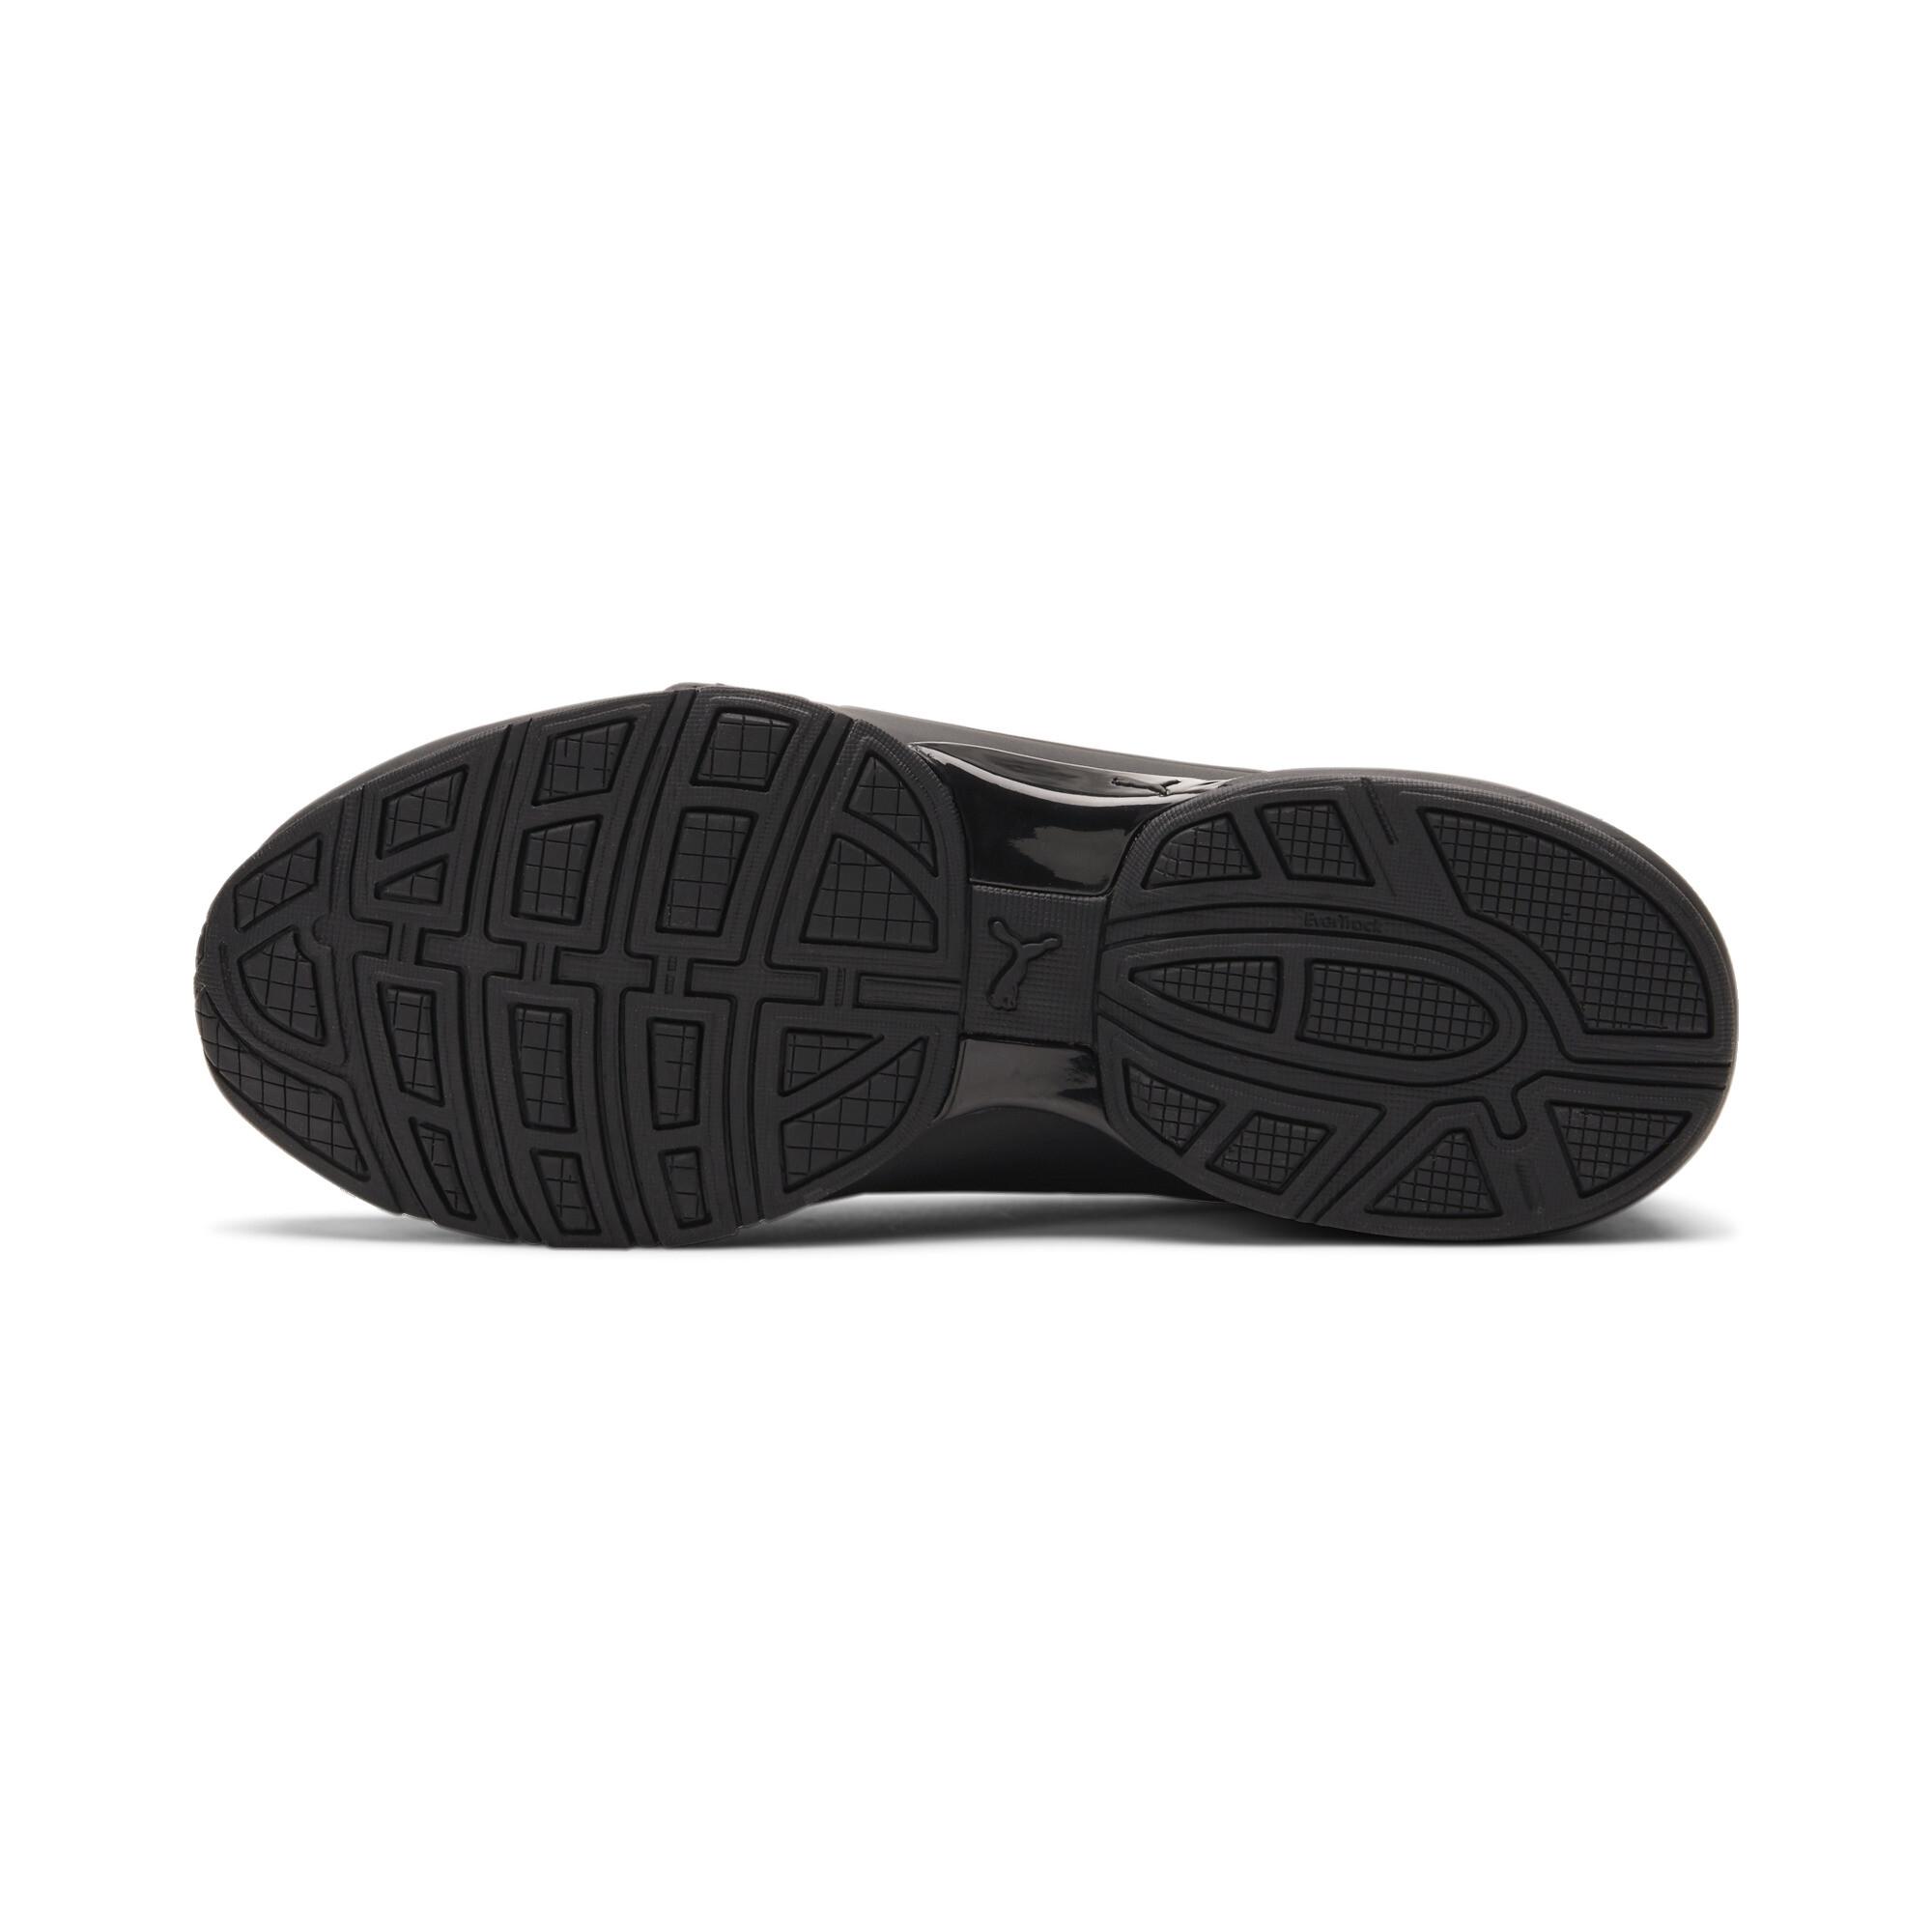 thumbnail 16 - PUMA Men's Viz Runner Graphic Sneakers